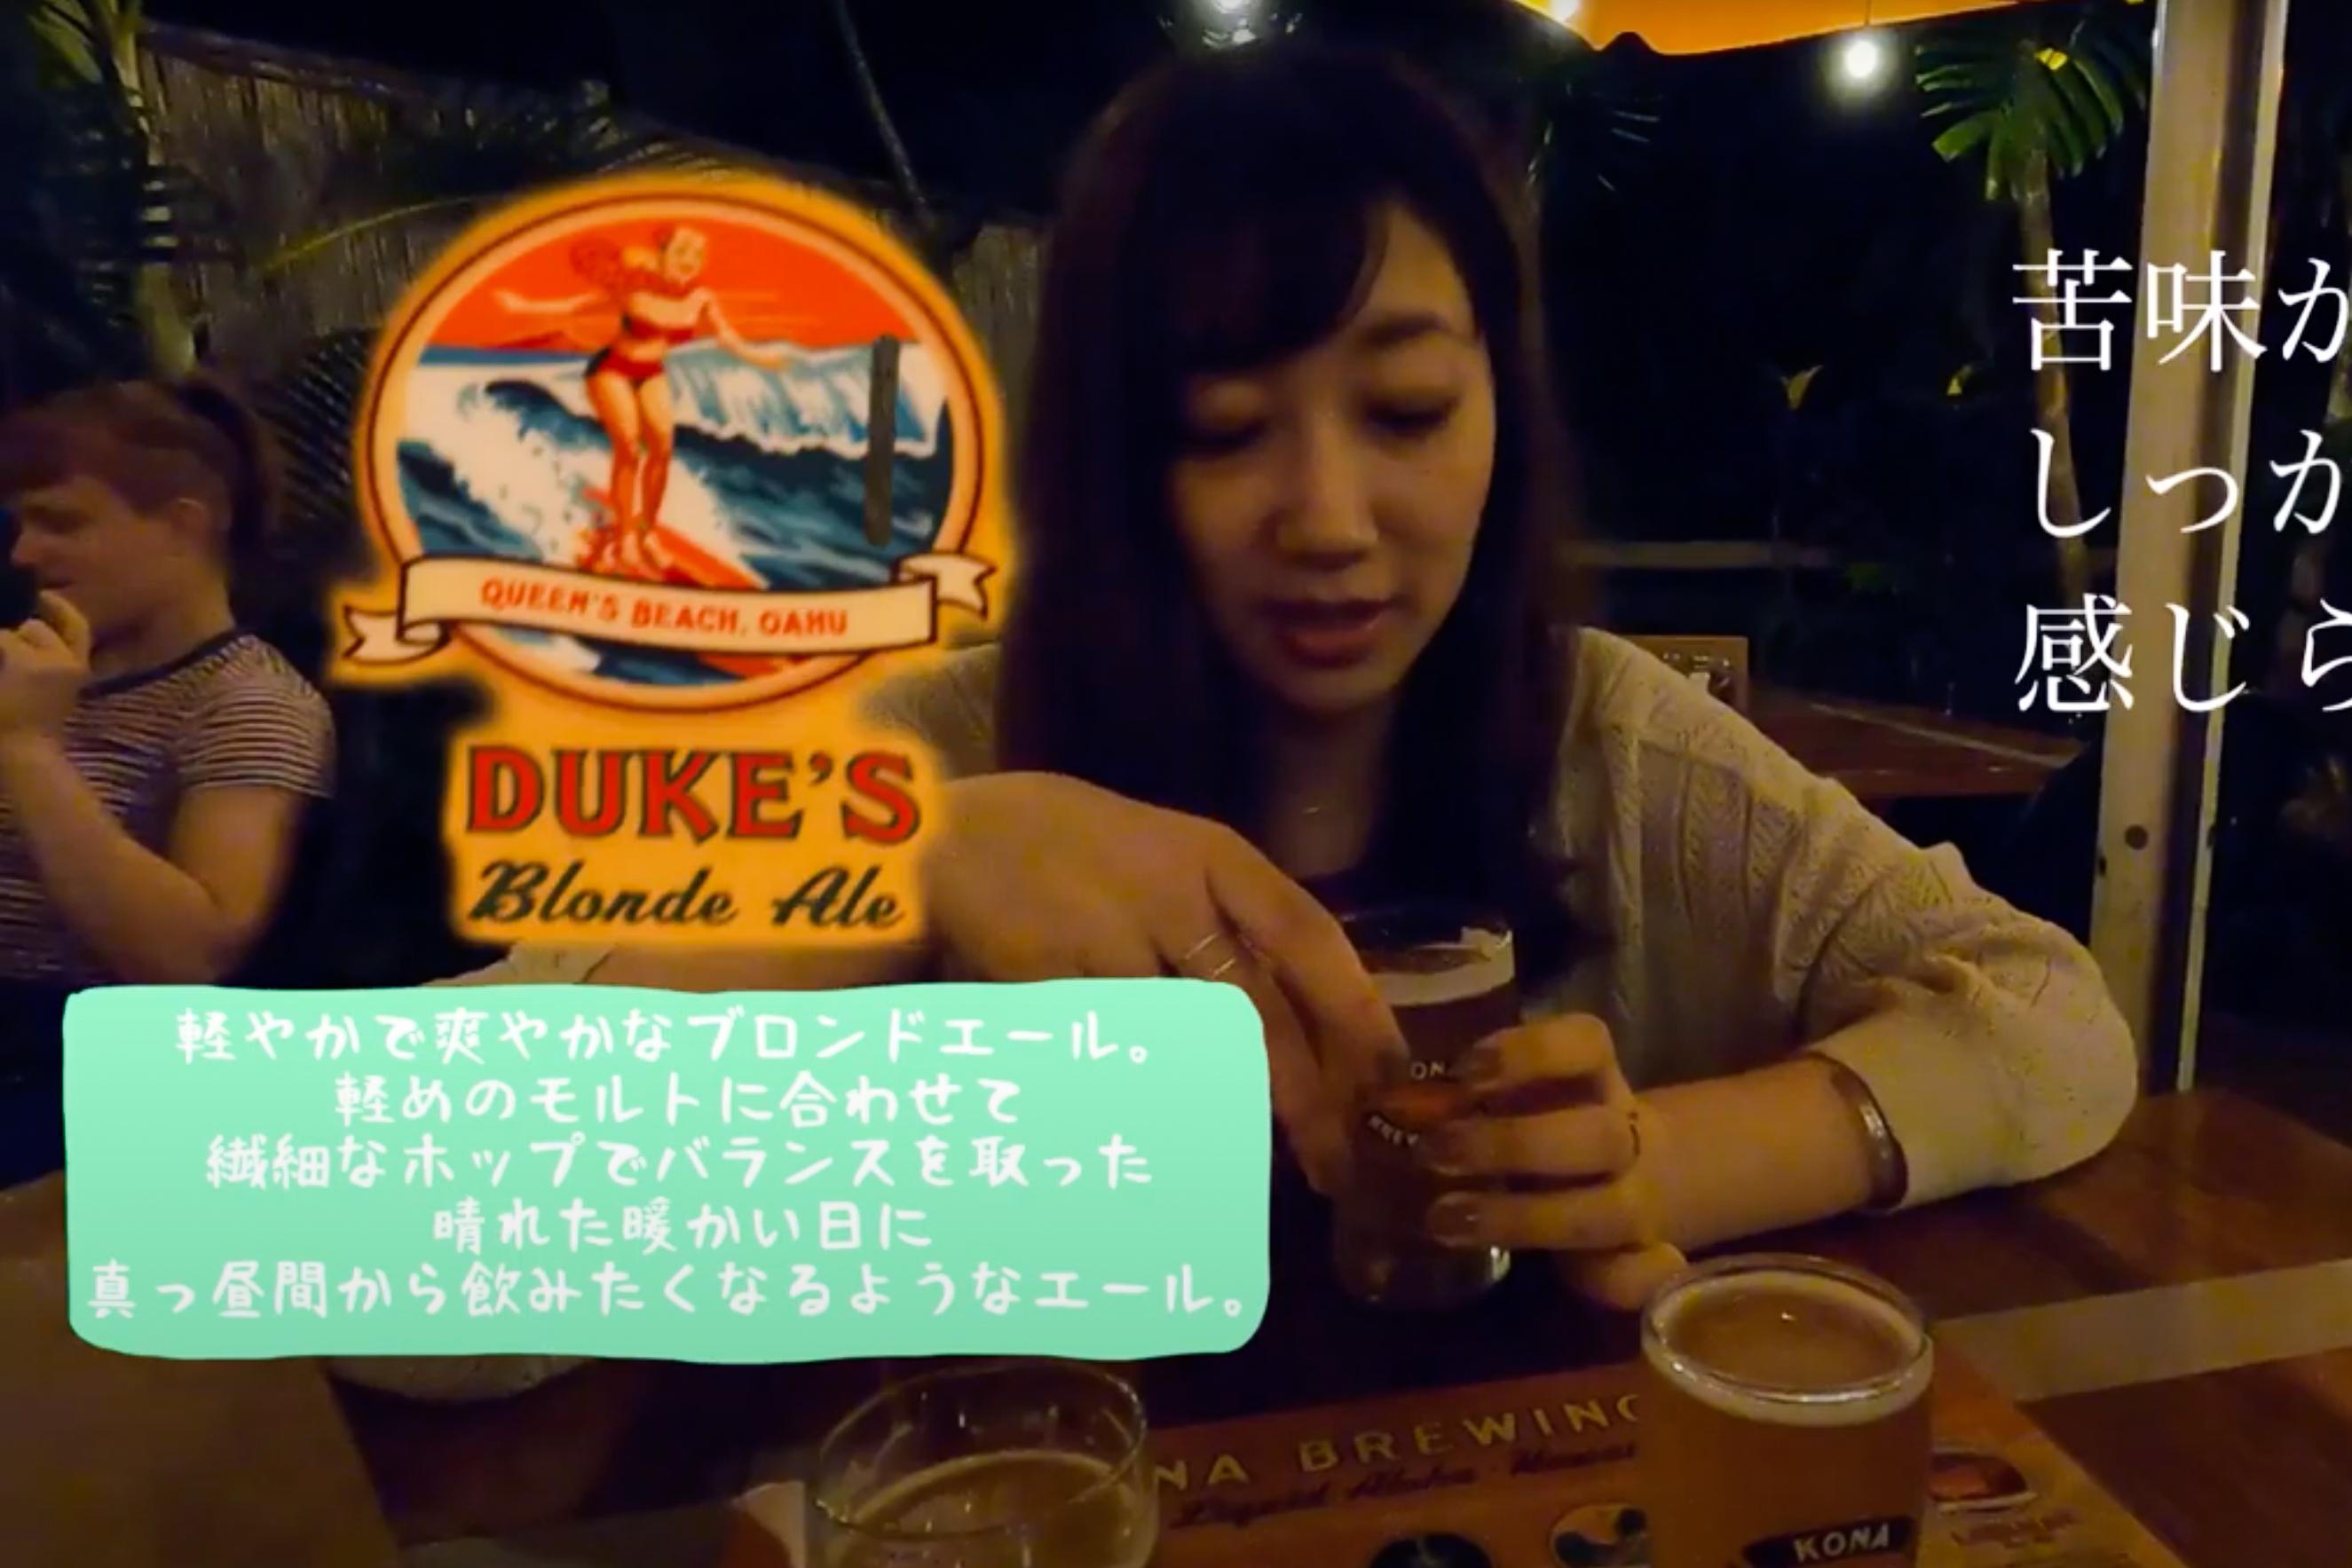 kona_brewingfactory beer tasting DUKE'S